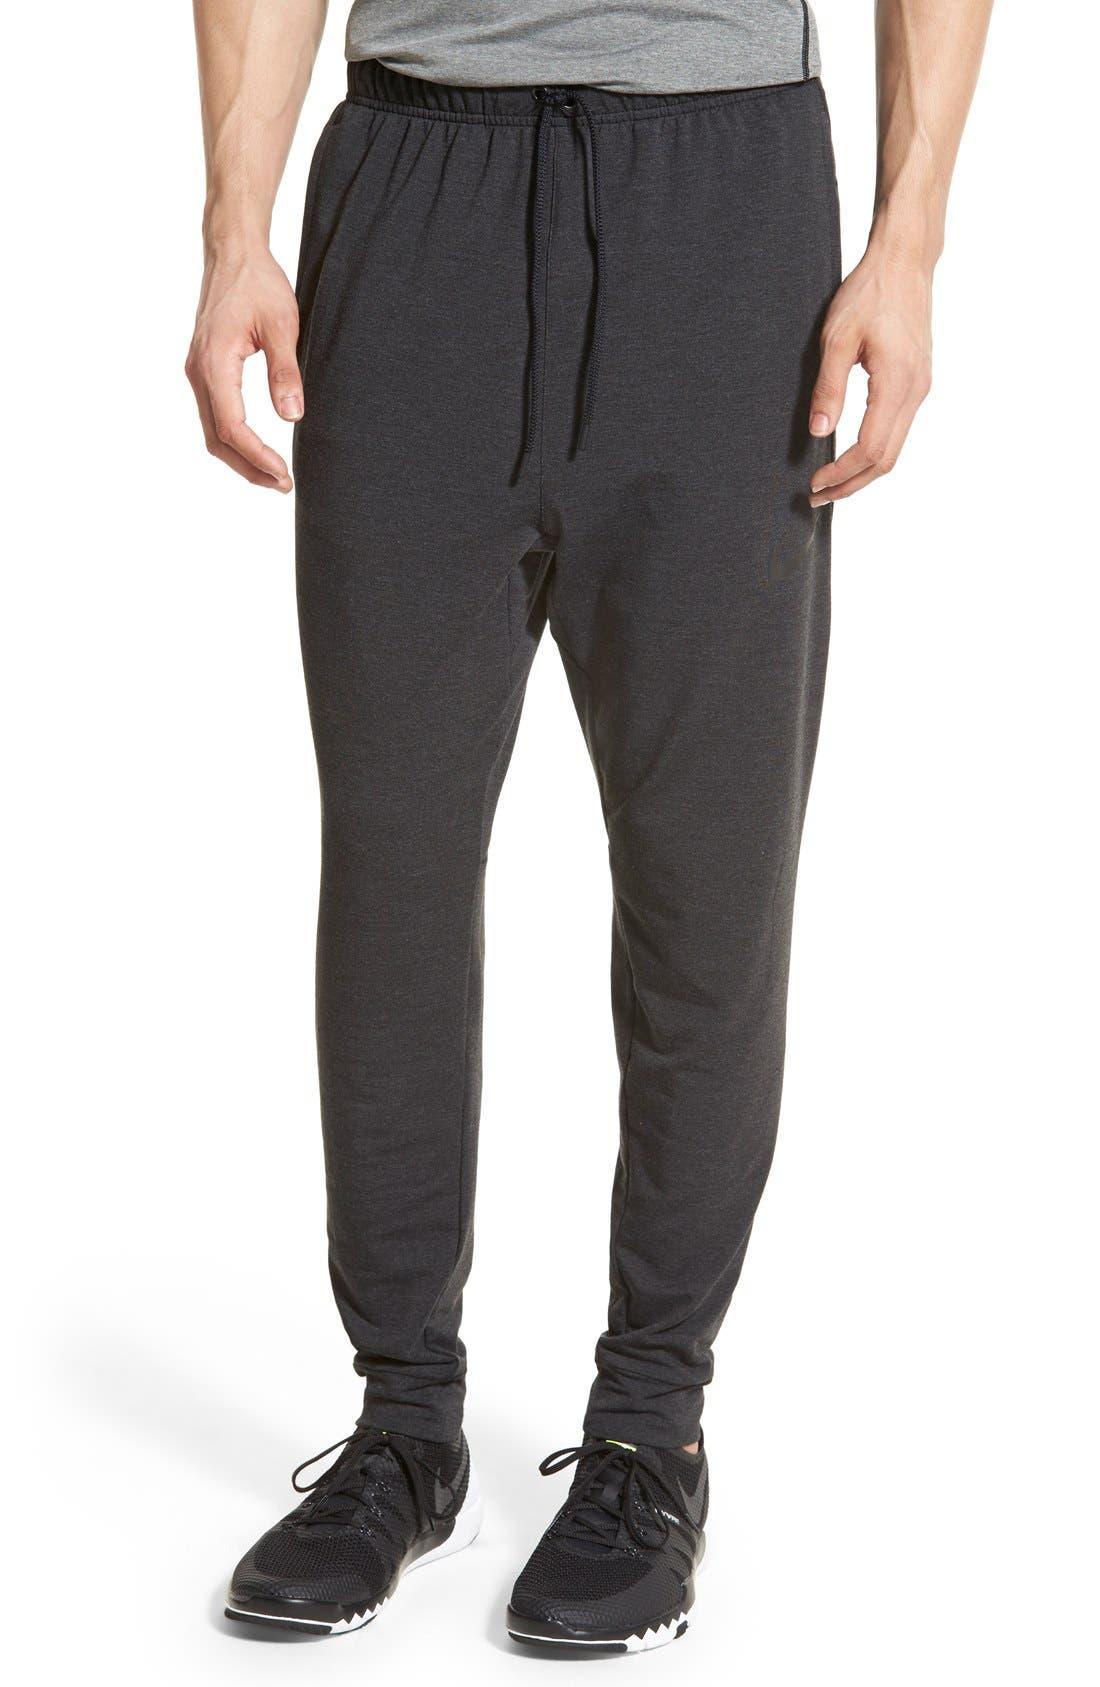 Main Image - Nike Dri-FIT Fleece Training Pants